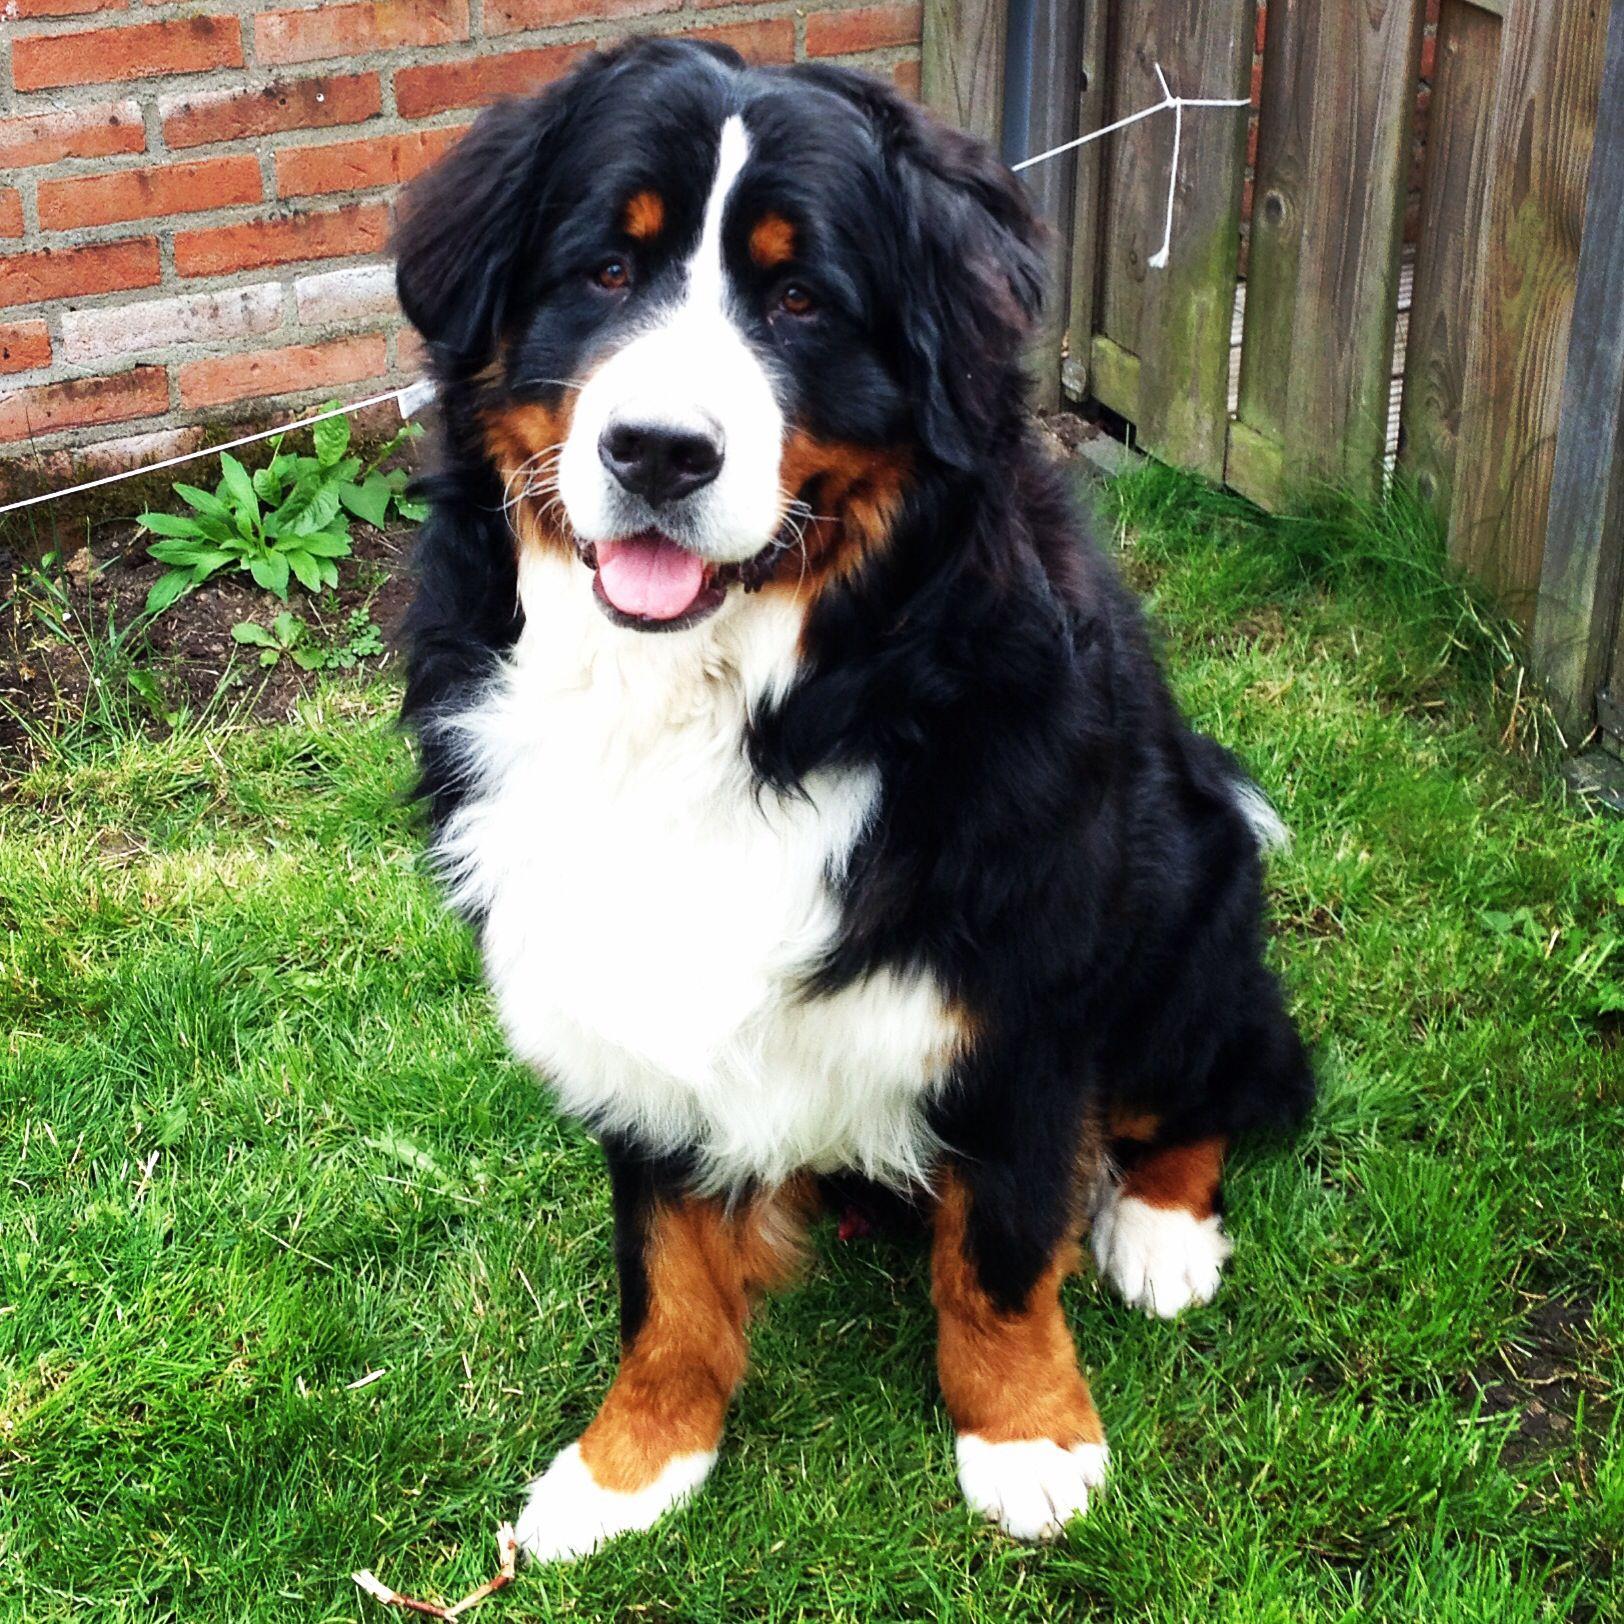 1 Year Old Jip Vanhetbartholomeushuis Bernersennen Bernesemountaindog Bernese Mountain Dog Bernese Puppy Dogs